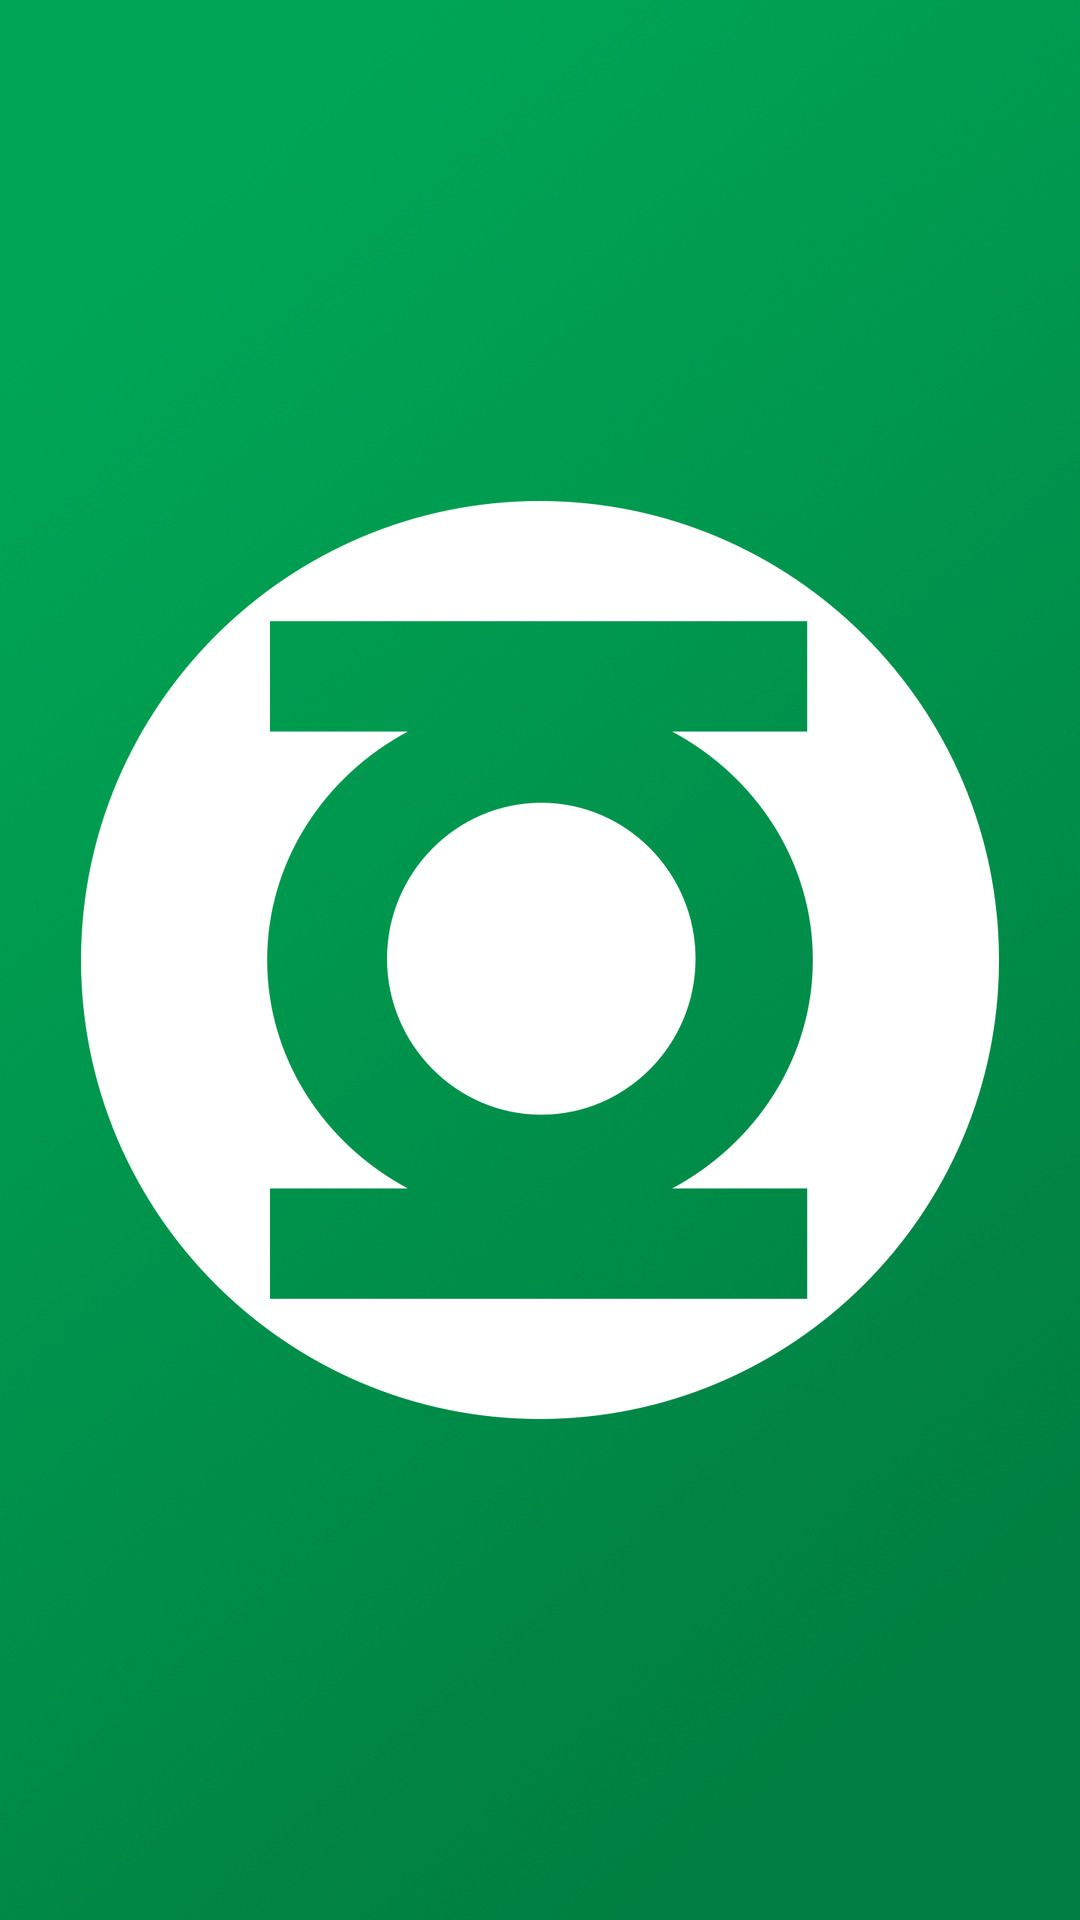 Wallpaper Green Lantern